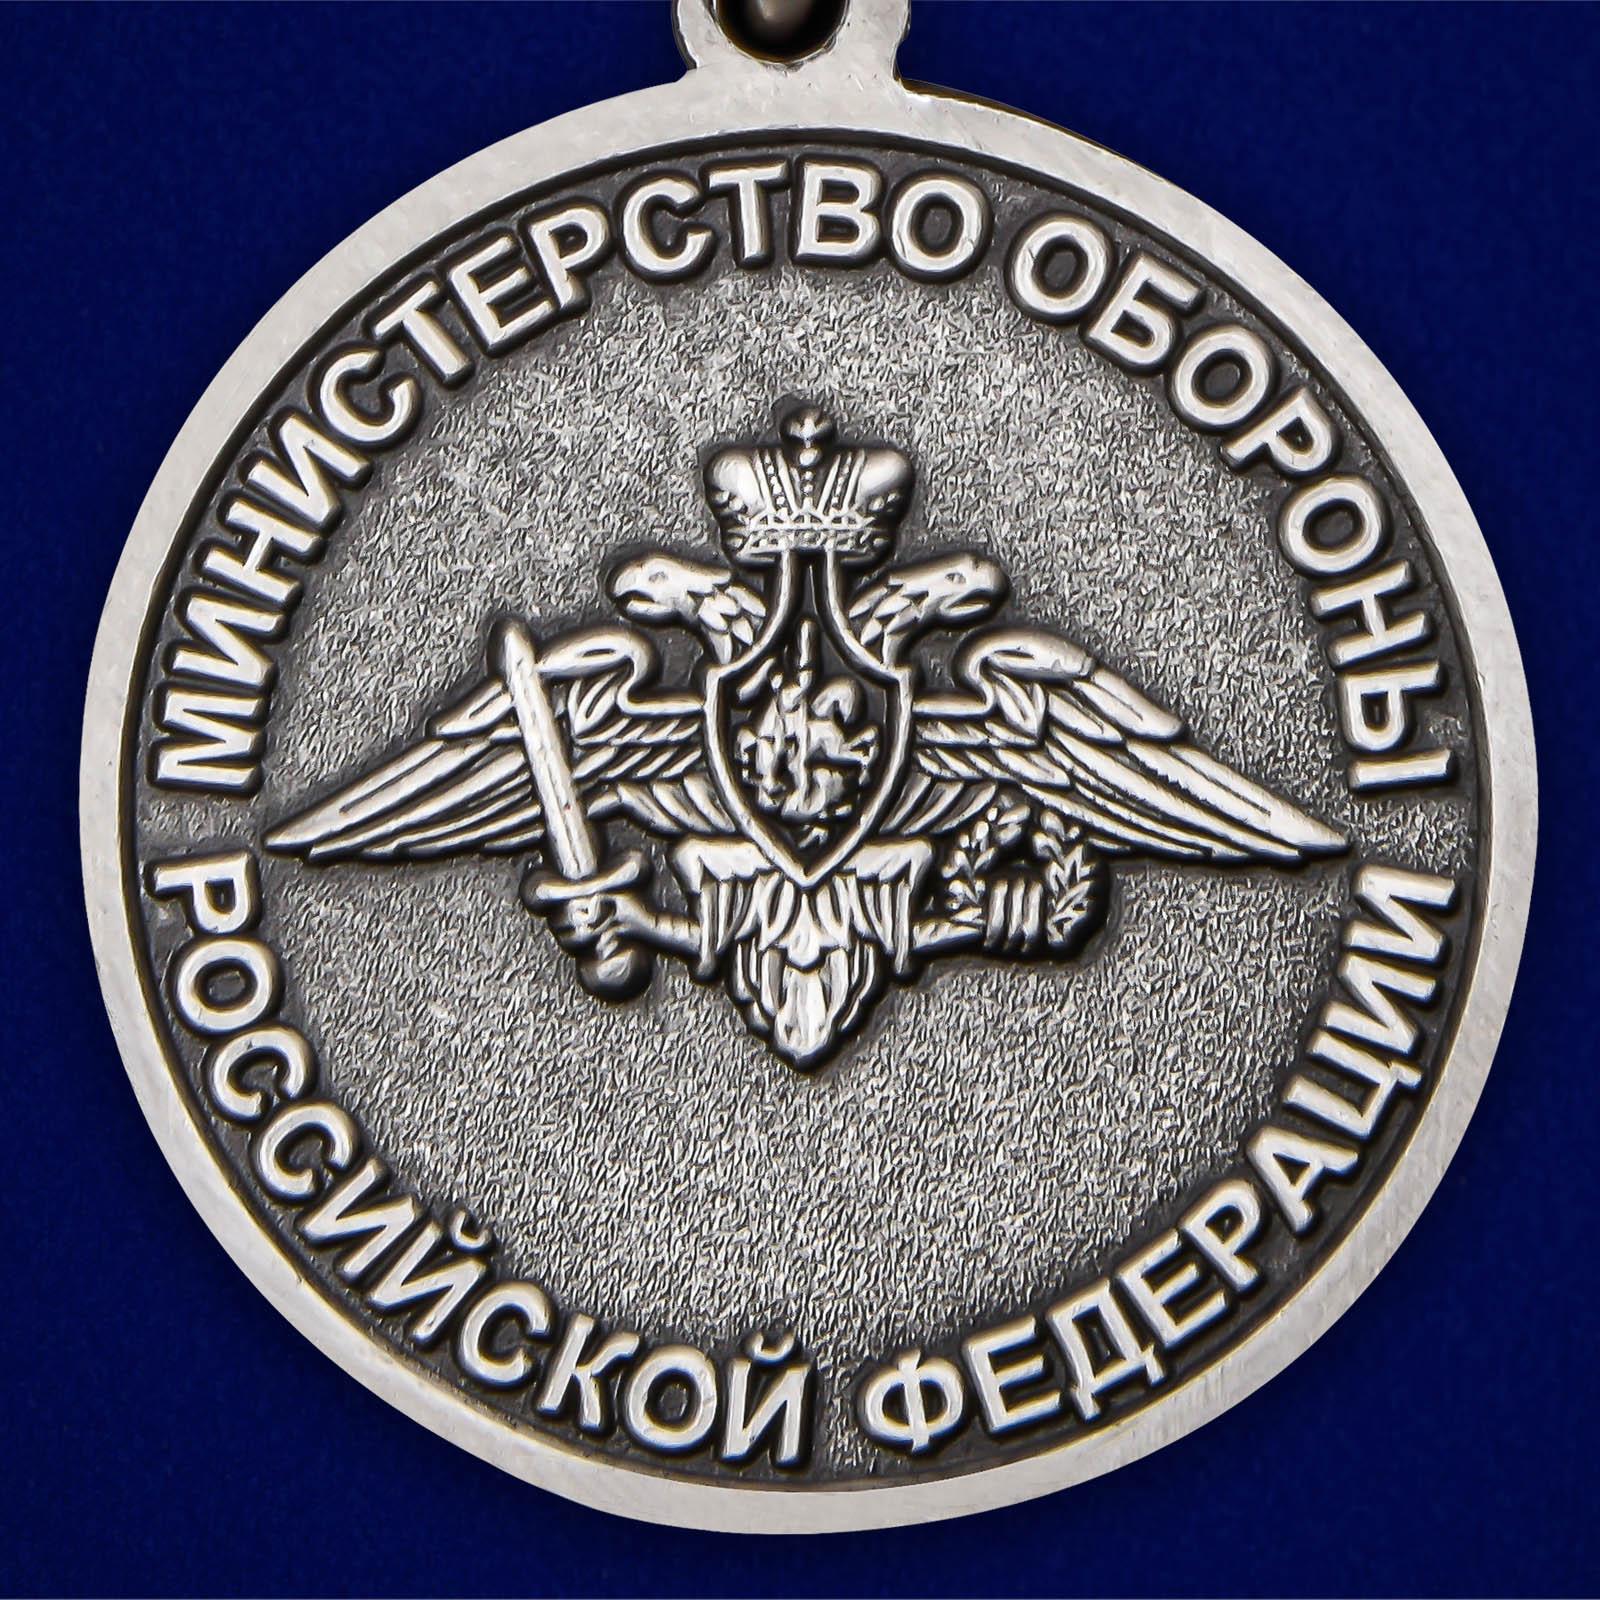 Памятная медаль Маршал Шестопалов МО РФ